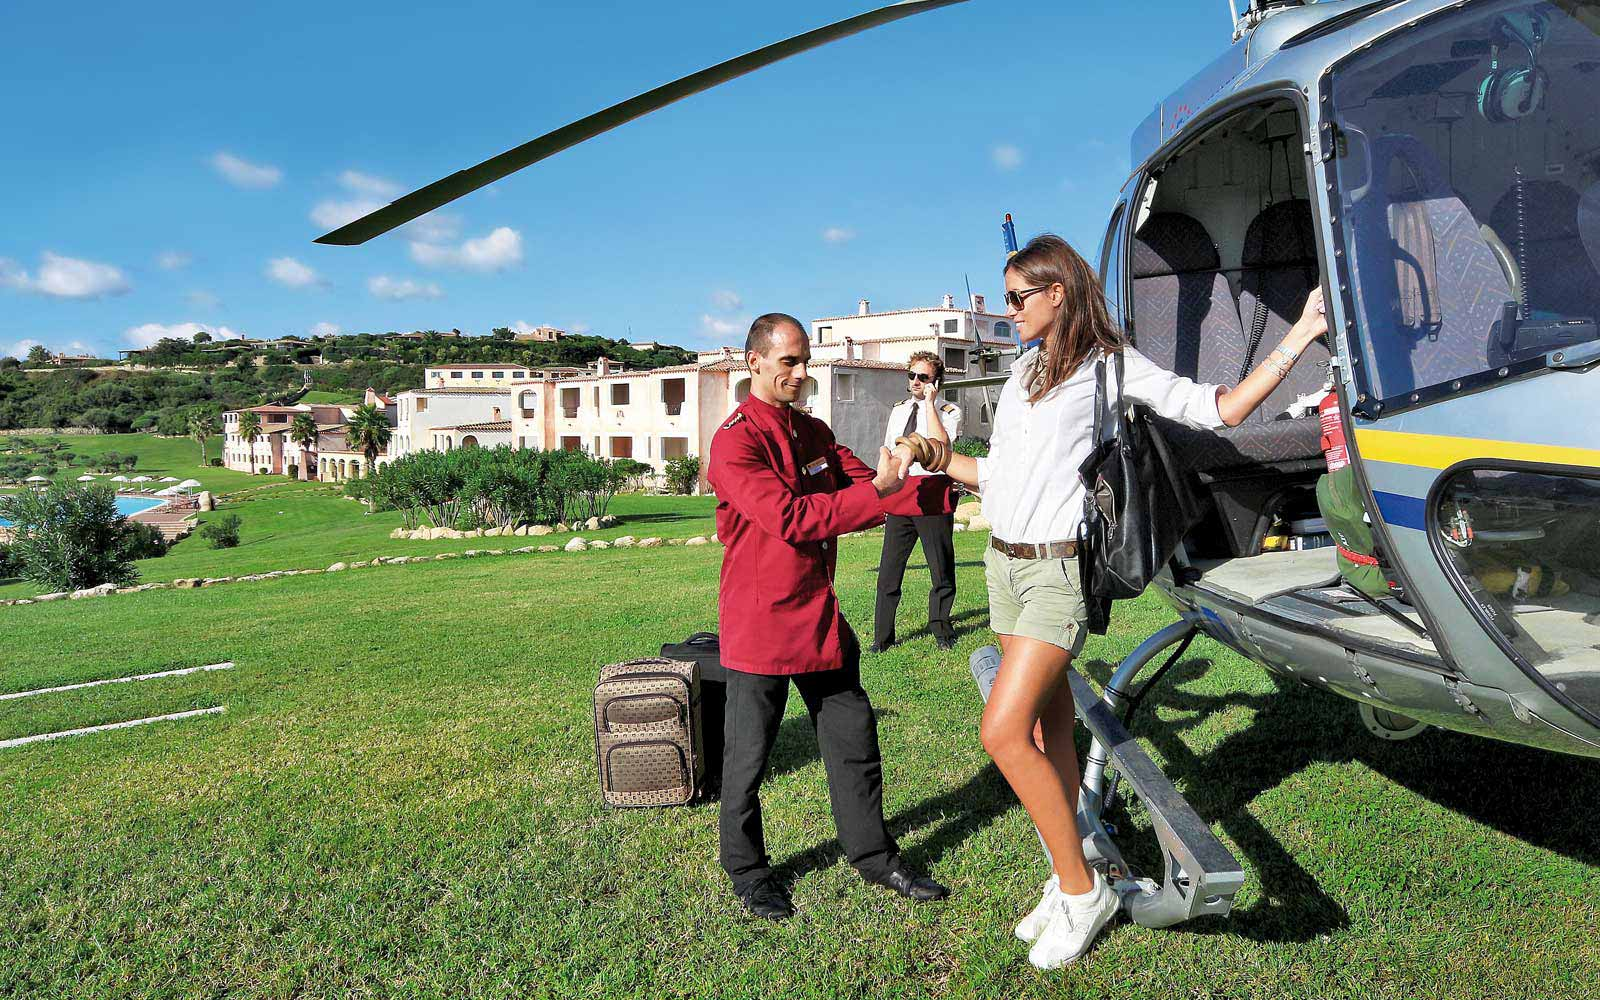 Helipad at Colonna Resort